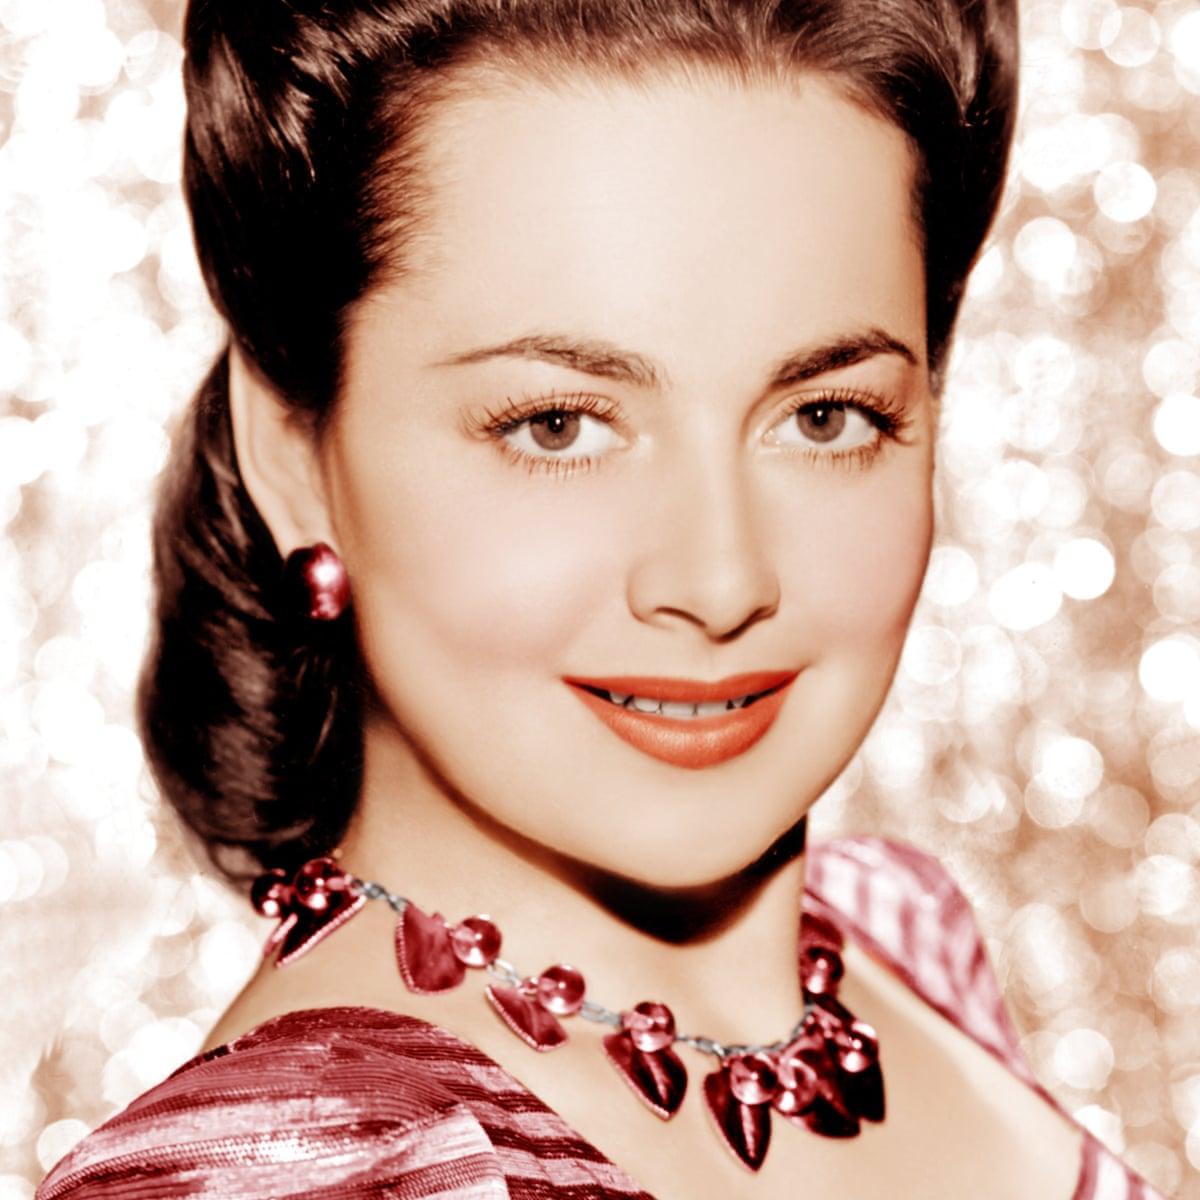 Olivia De Havilland Hollywood S Queen Of Radiant Calm Peter Bradshaw Film The Guardian